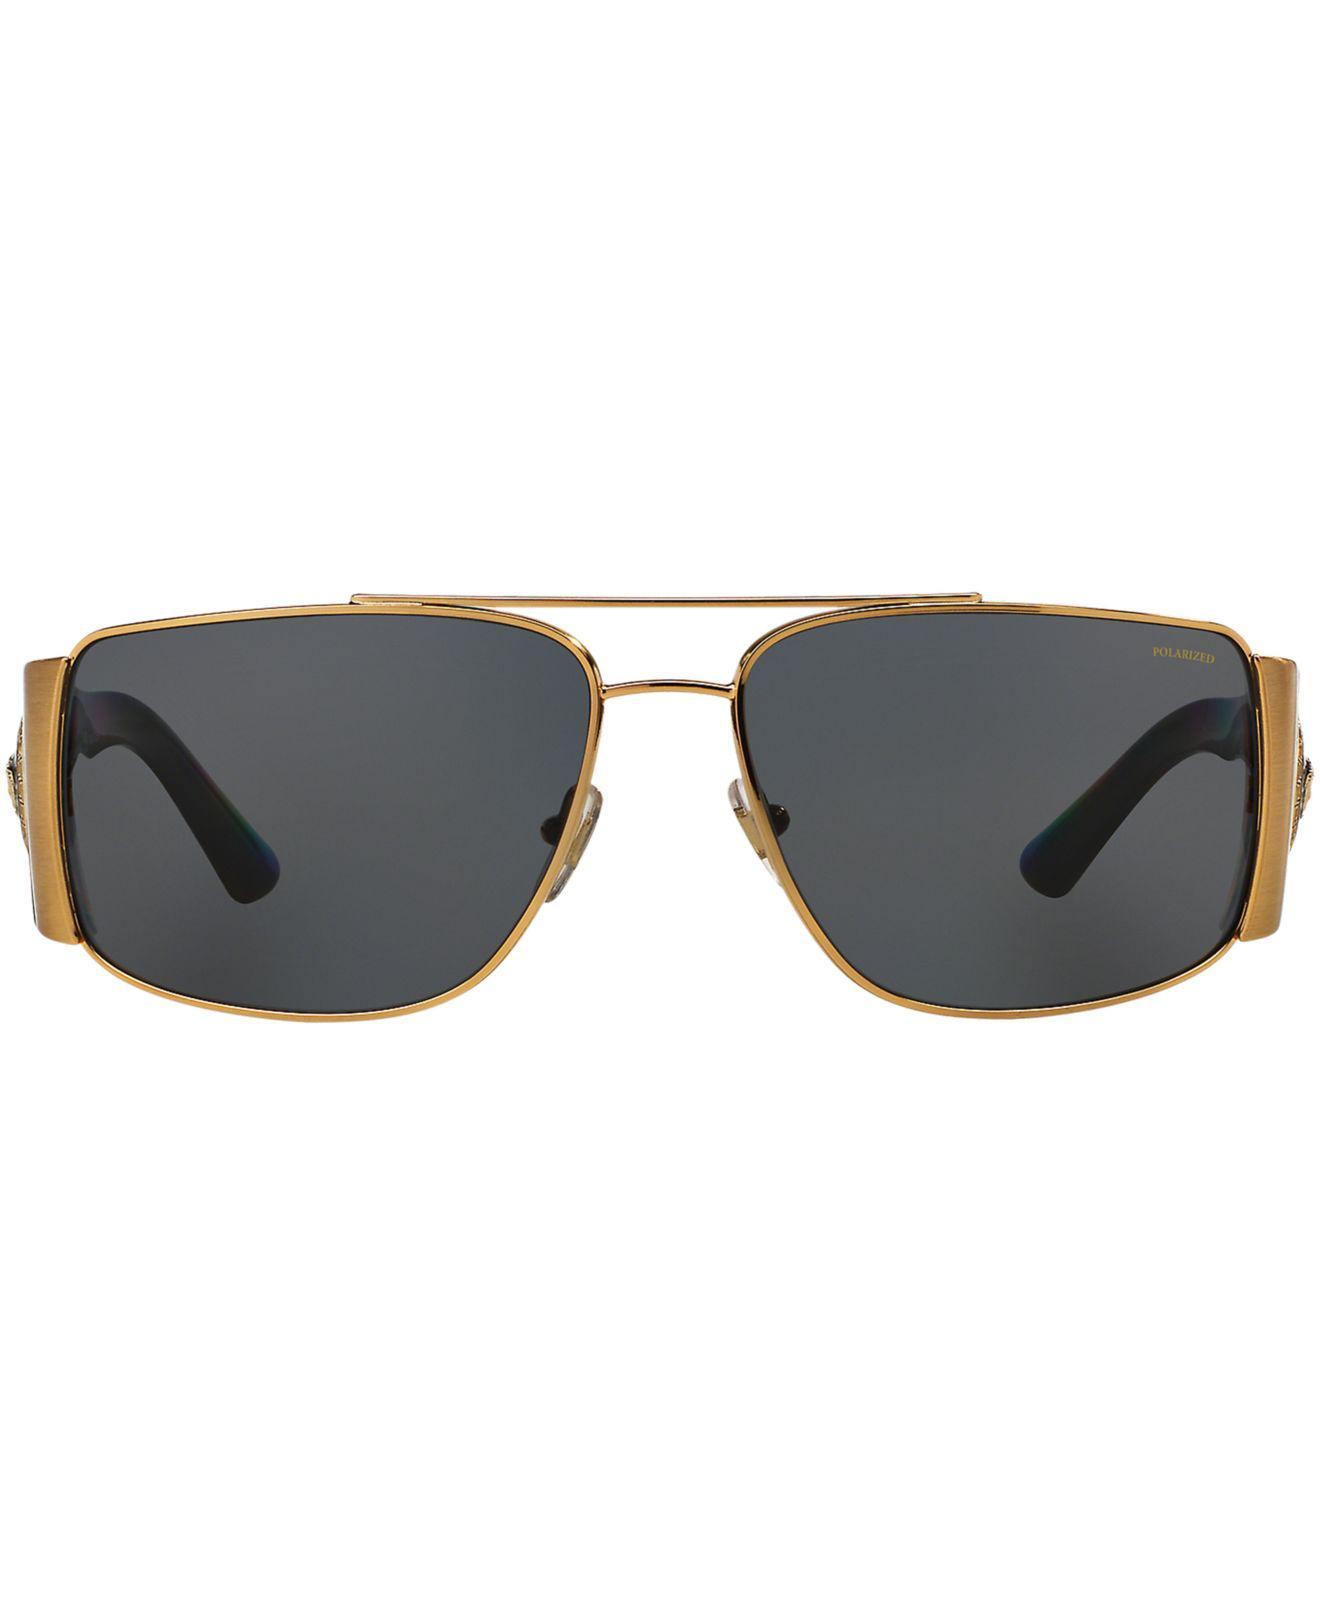 6743c75f00e Lyst - Versace Sunglasses